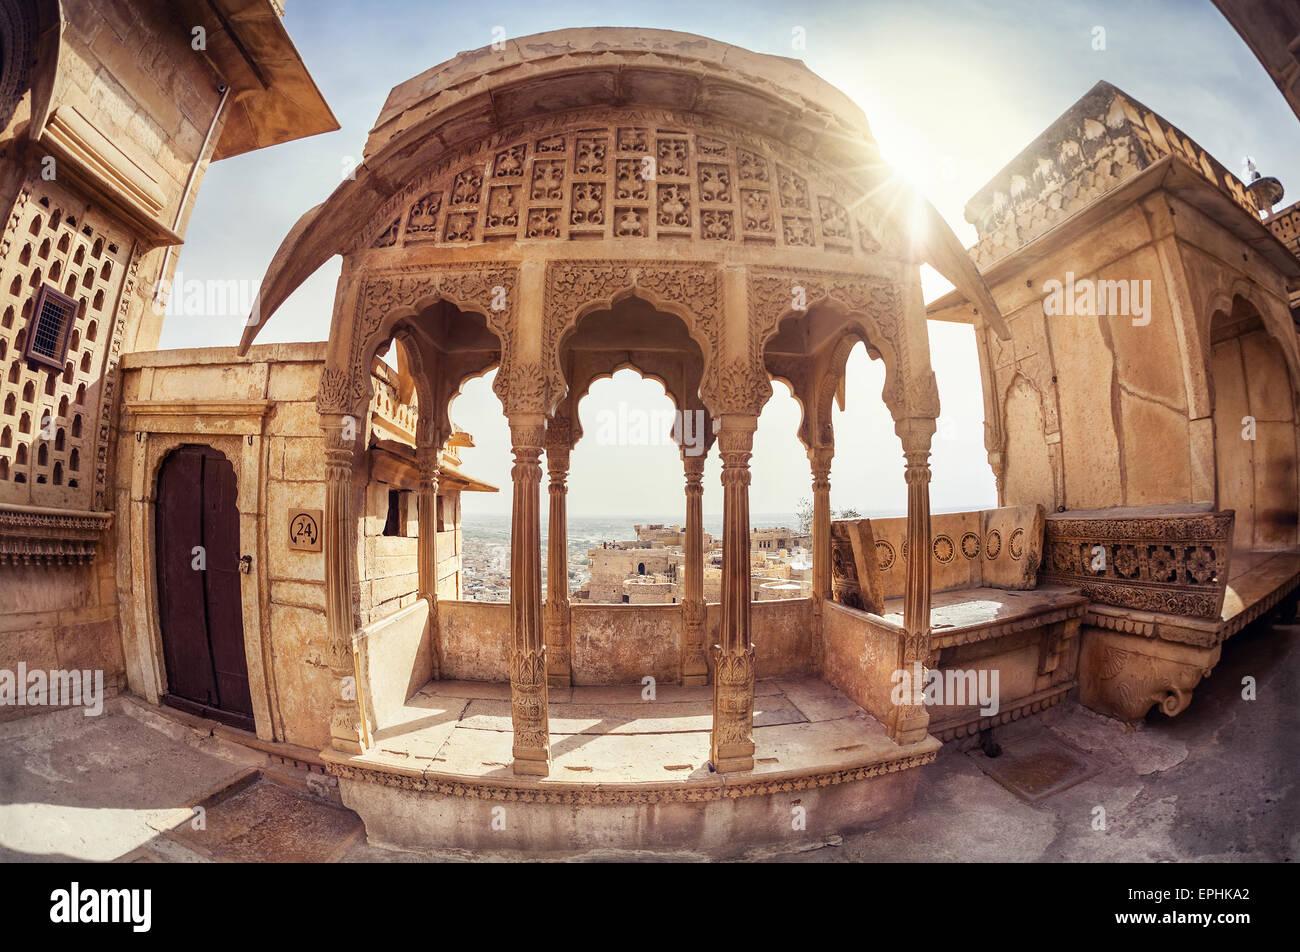 Zenana Mahal in City Palace Museum di Jaisalmer fort, Rajasthan, India Immagini Stock